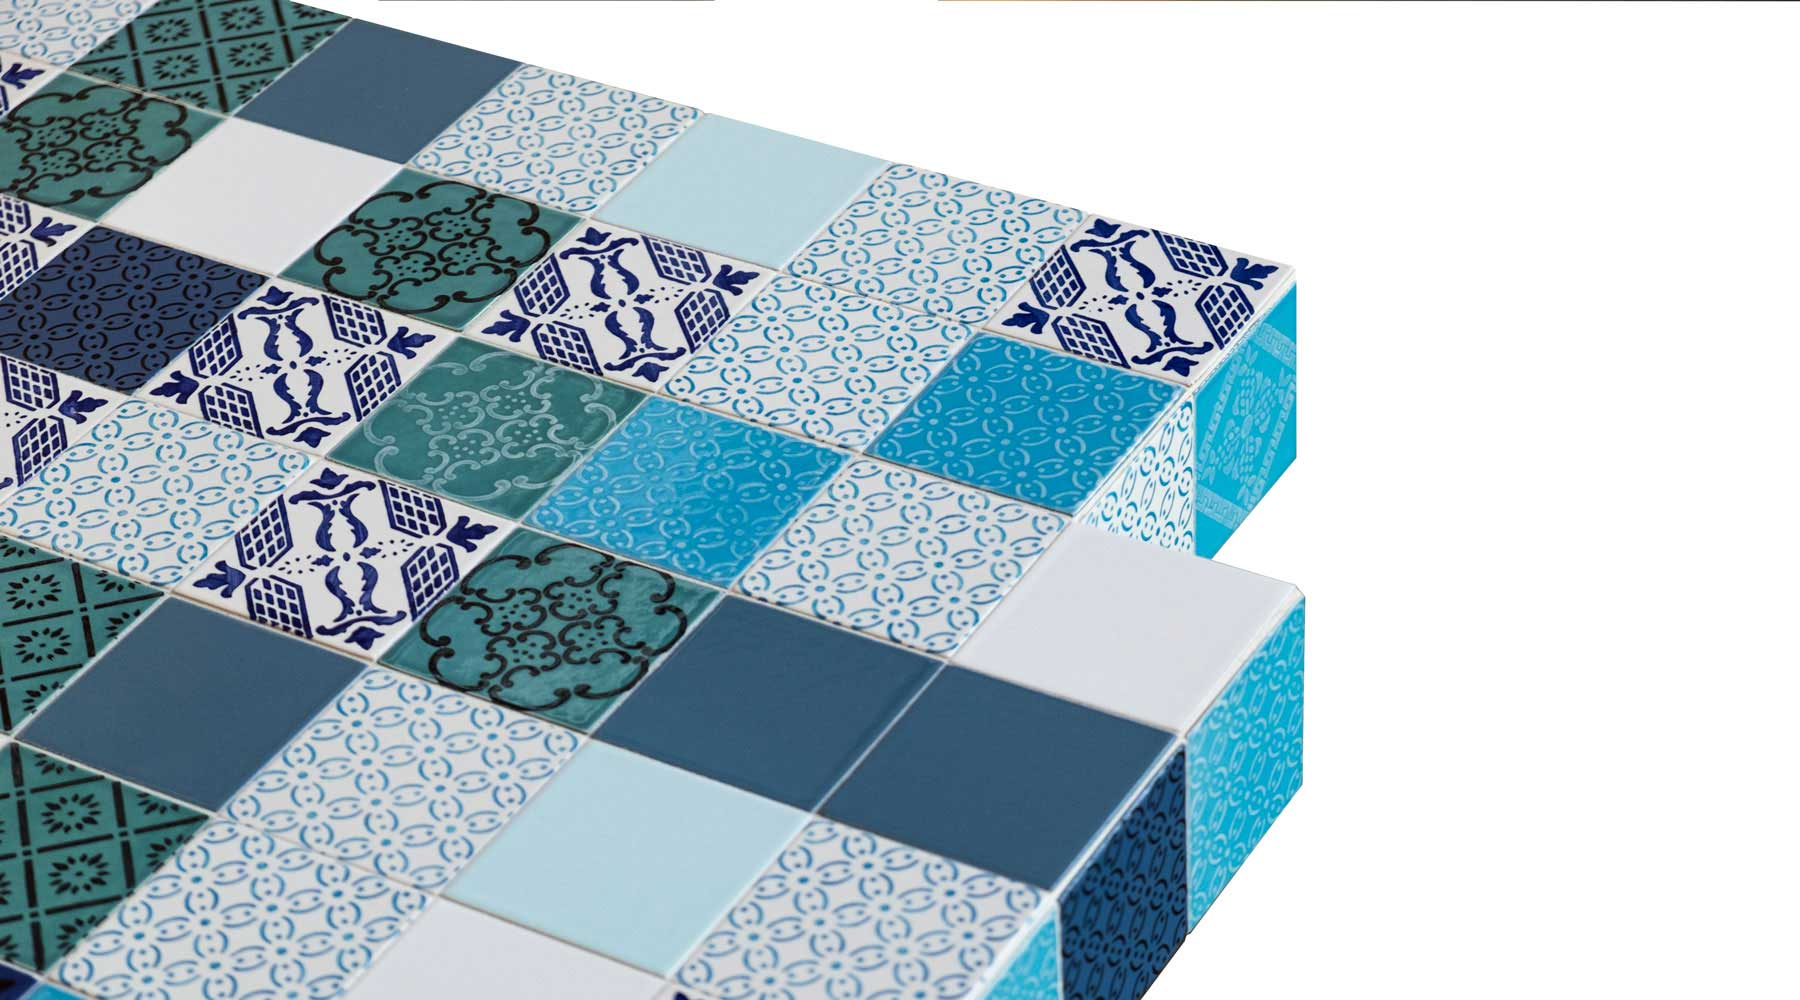 Tavolo con piastrelle in ceramica dipinta a mano lago madeterraneo